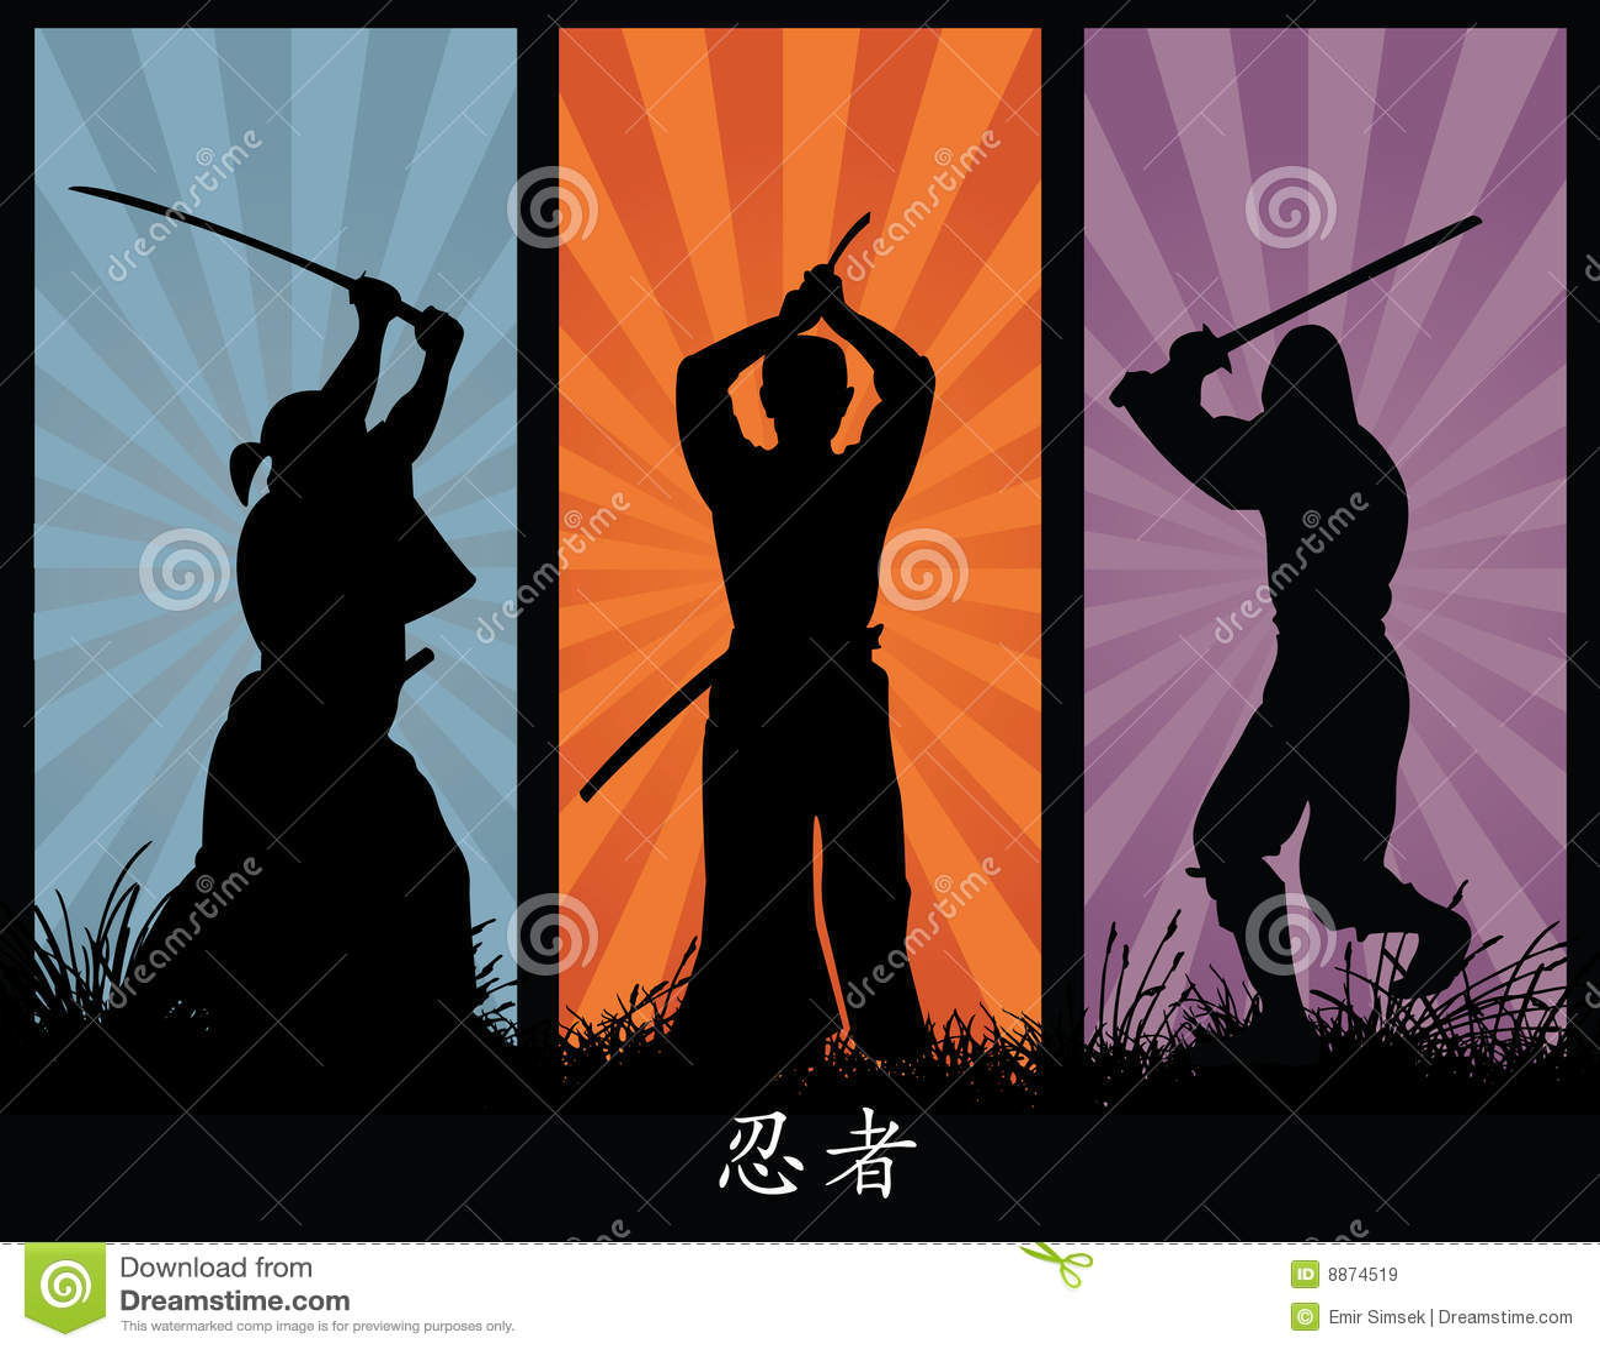 Japanese Samurai Girl Wallpaper Ninja Silhouettes Royalty Free Stock Images Image 8874519